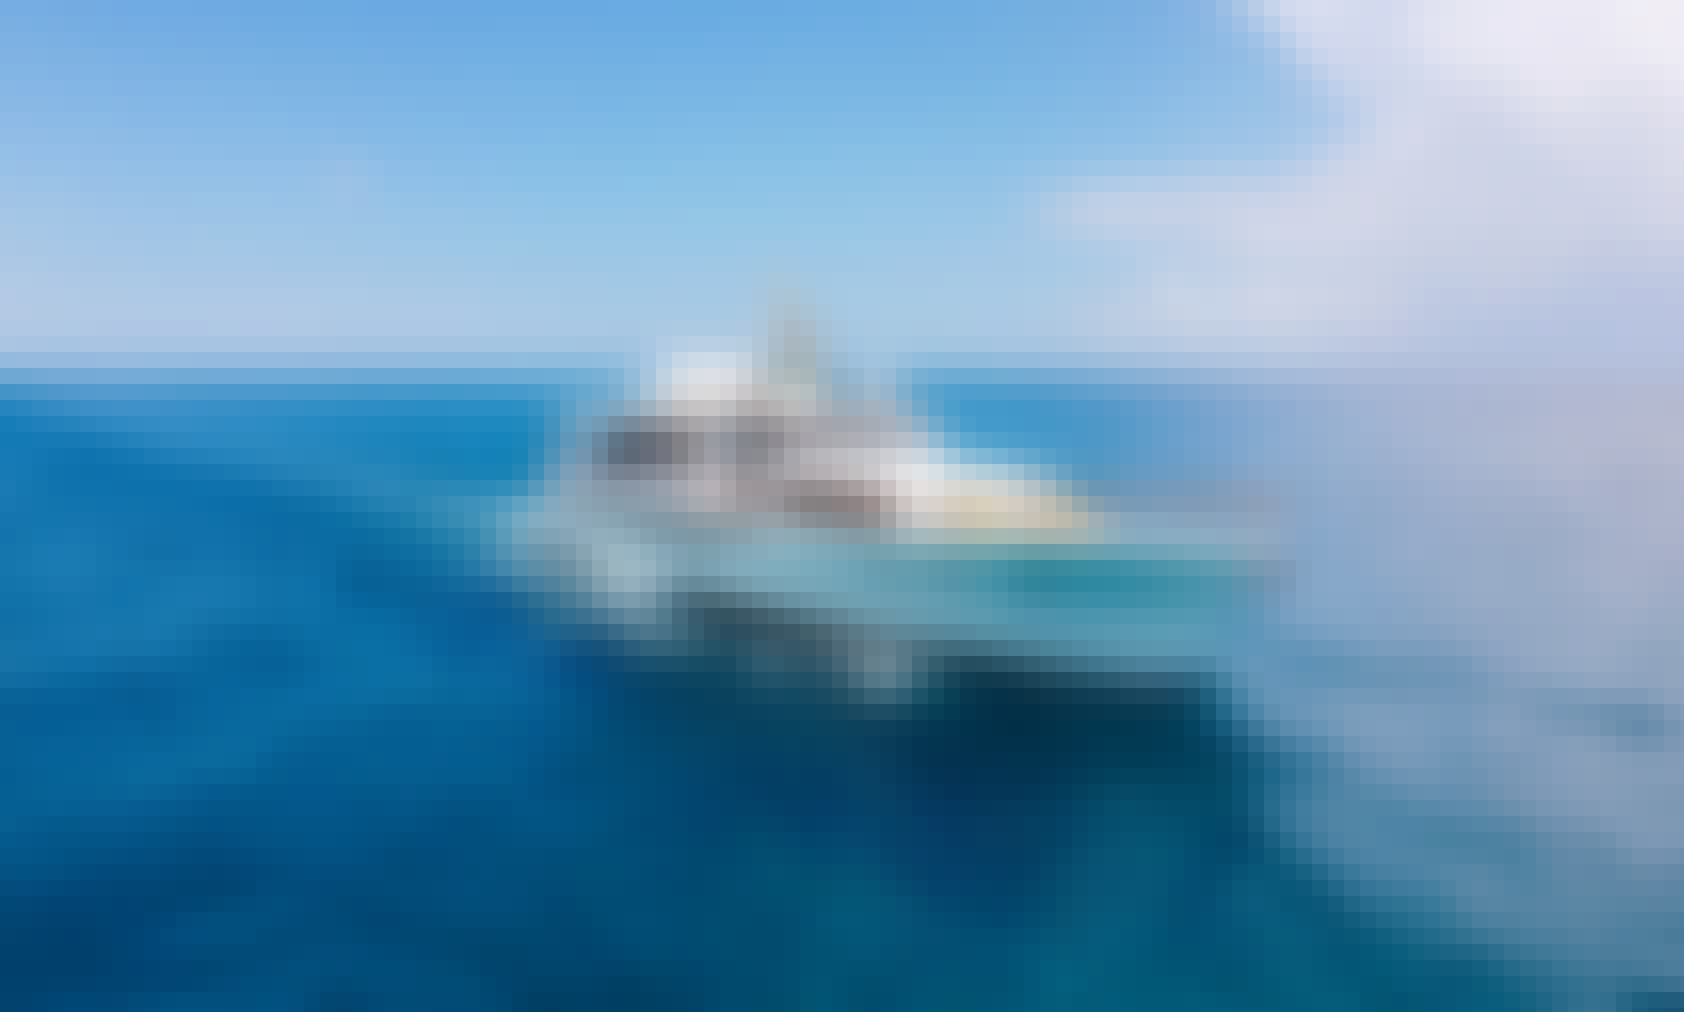 Anam Cara Burger Yacht 75' Classic in Palm Beach, Florida